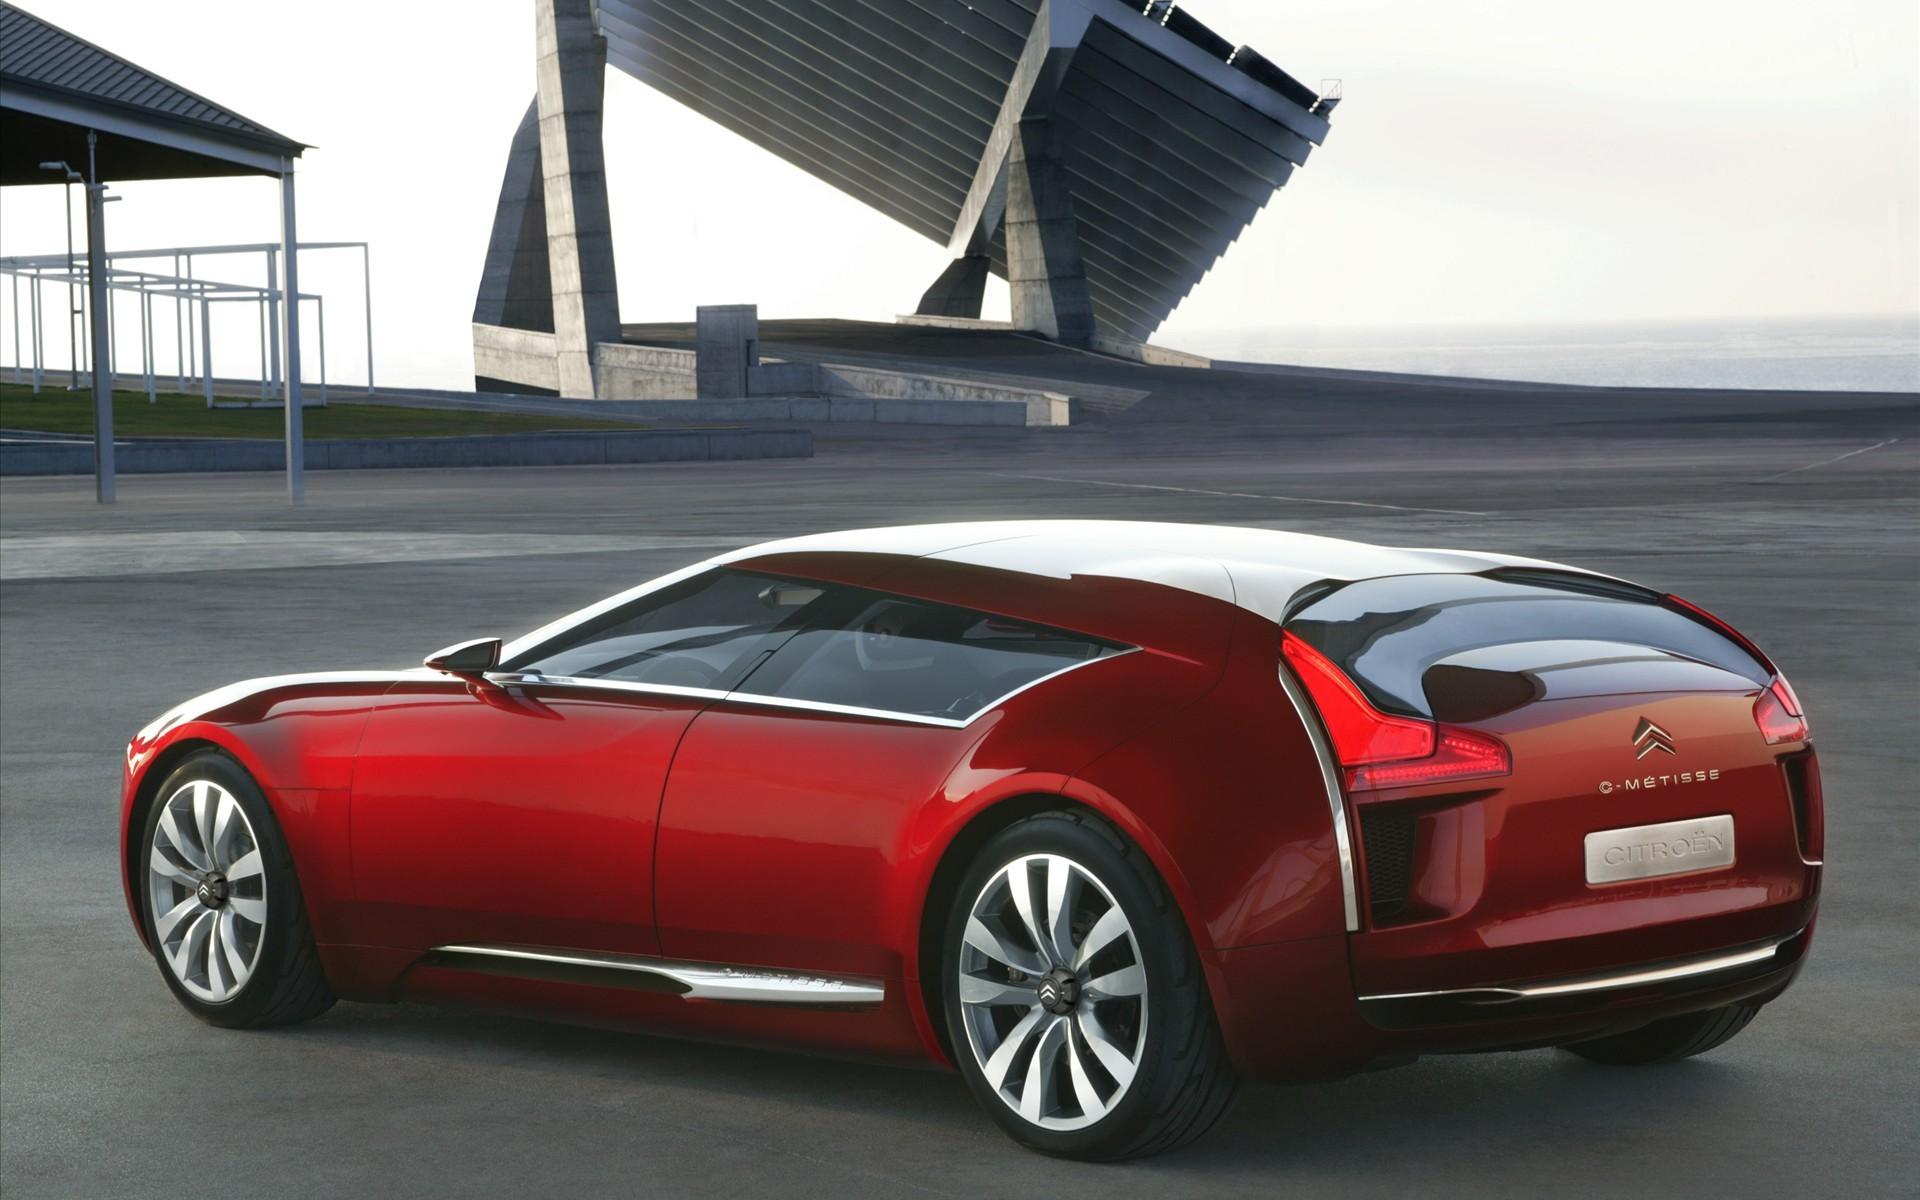 citroen c metisse concept car carros usa. Black Bedroom Furniture Sets. Home Design Ideas